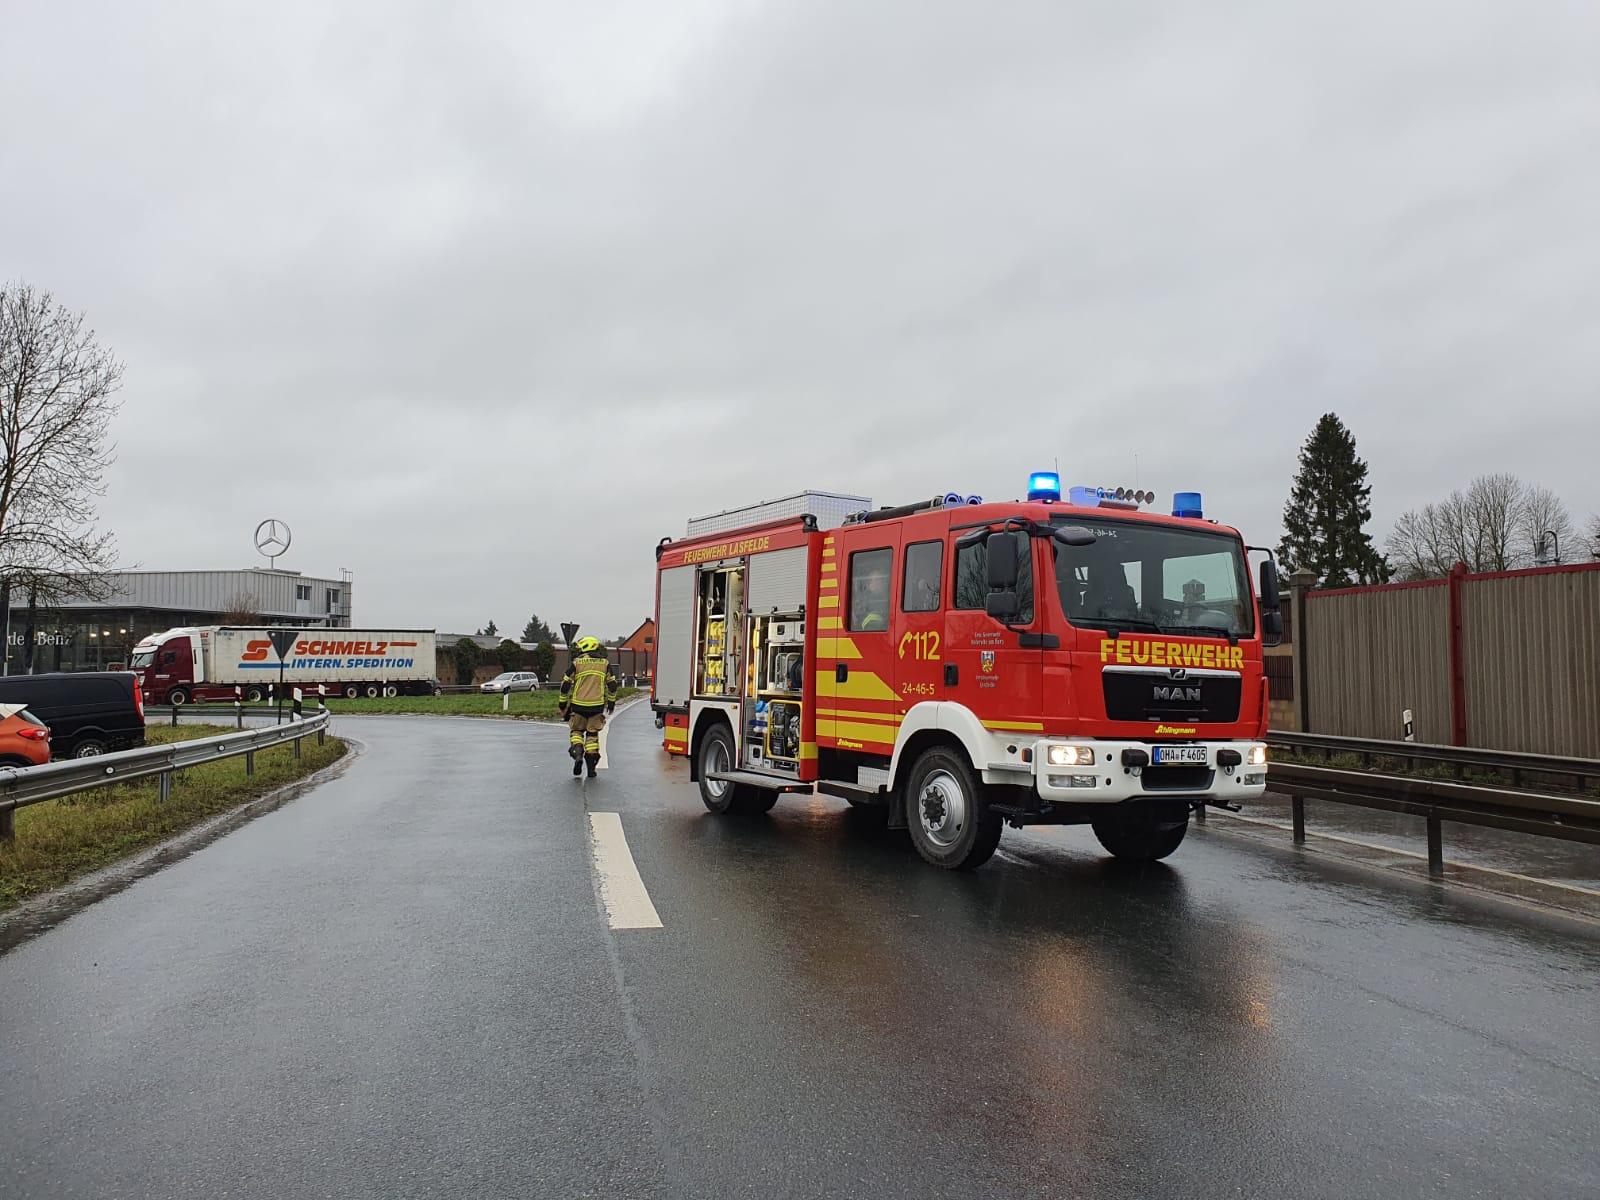 #0015 - HLF10 Feuerwehr Osterode Ortsfeuerwehr Lasfelde